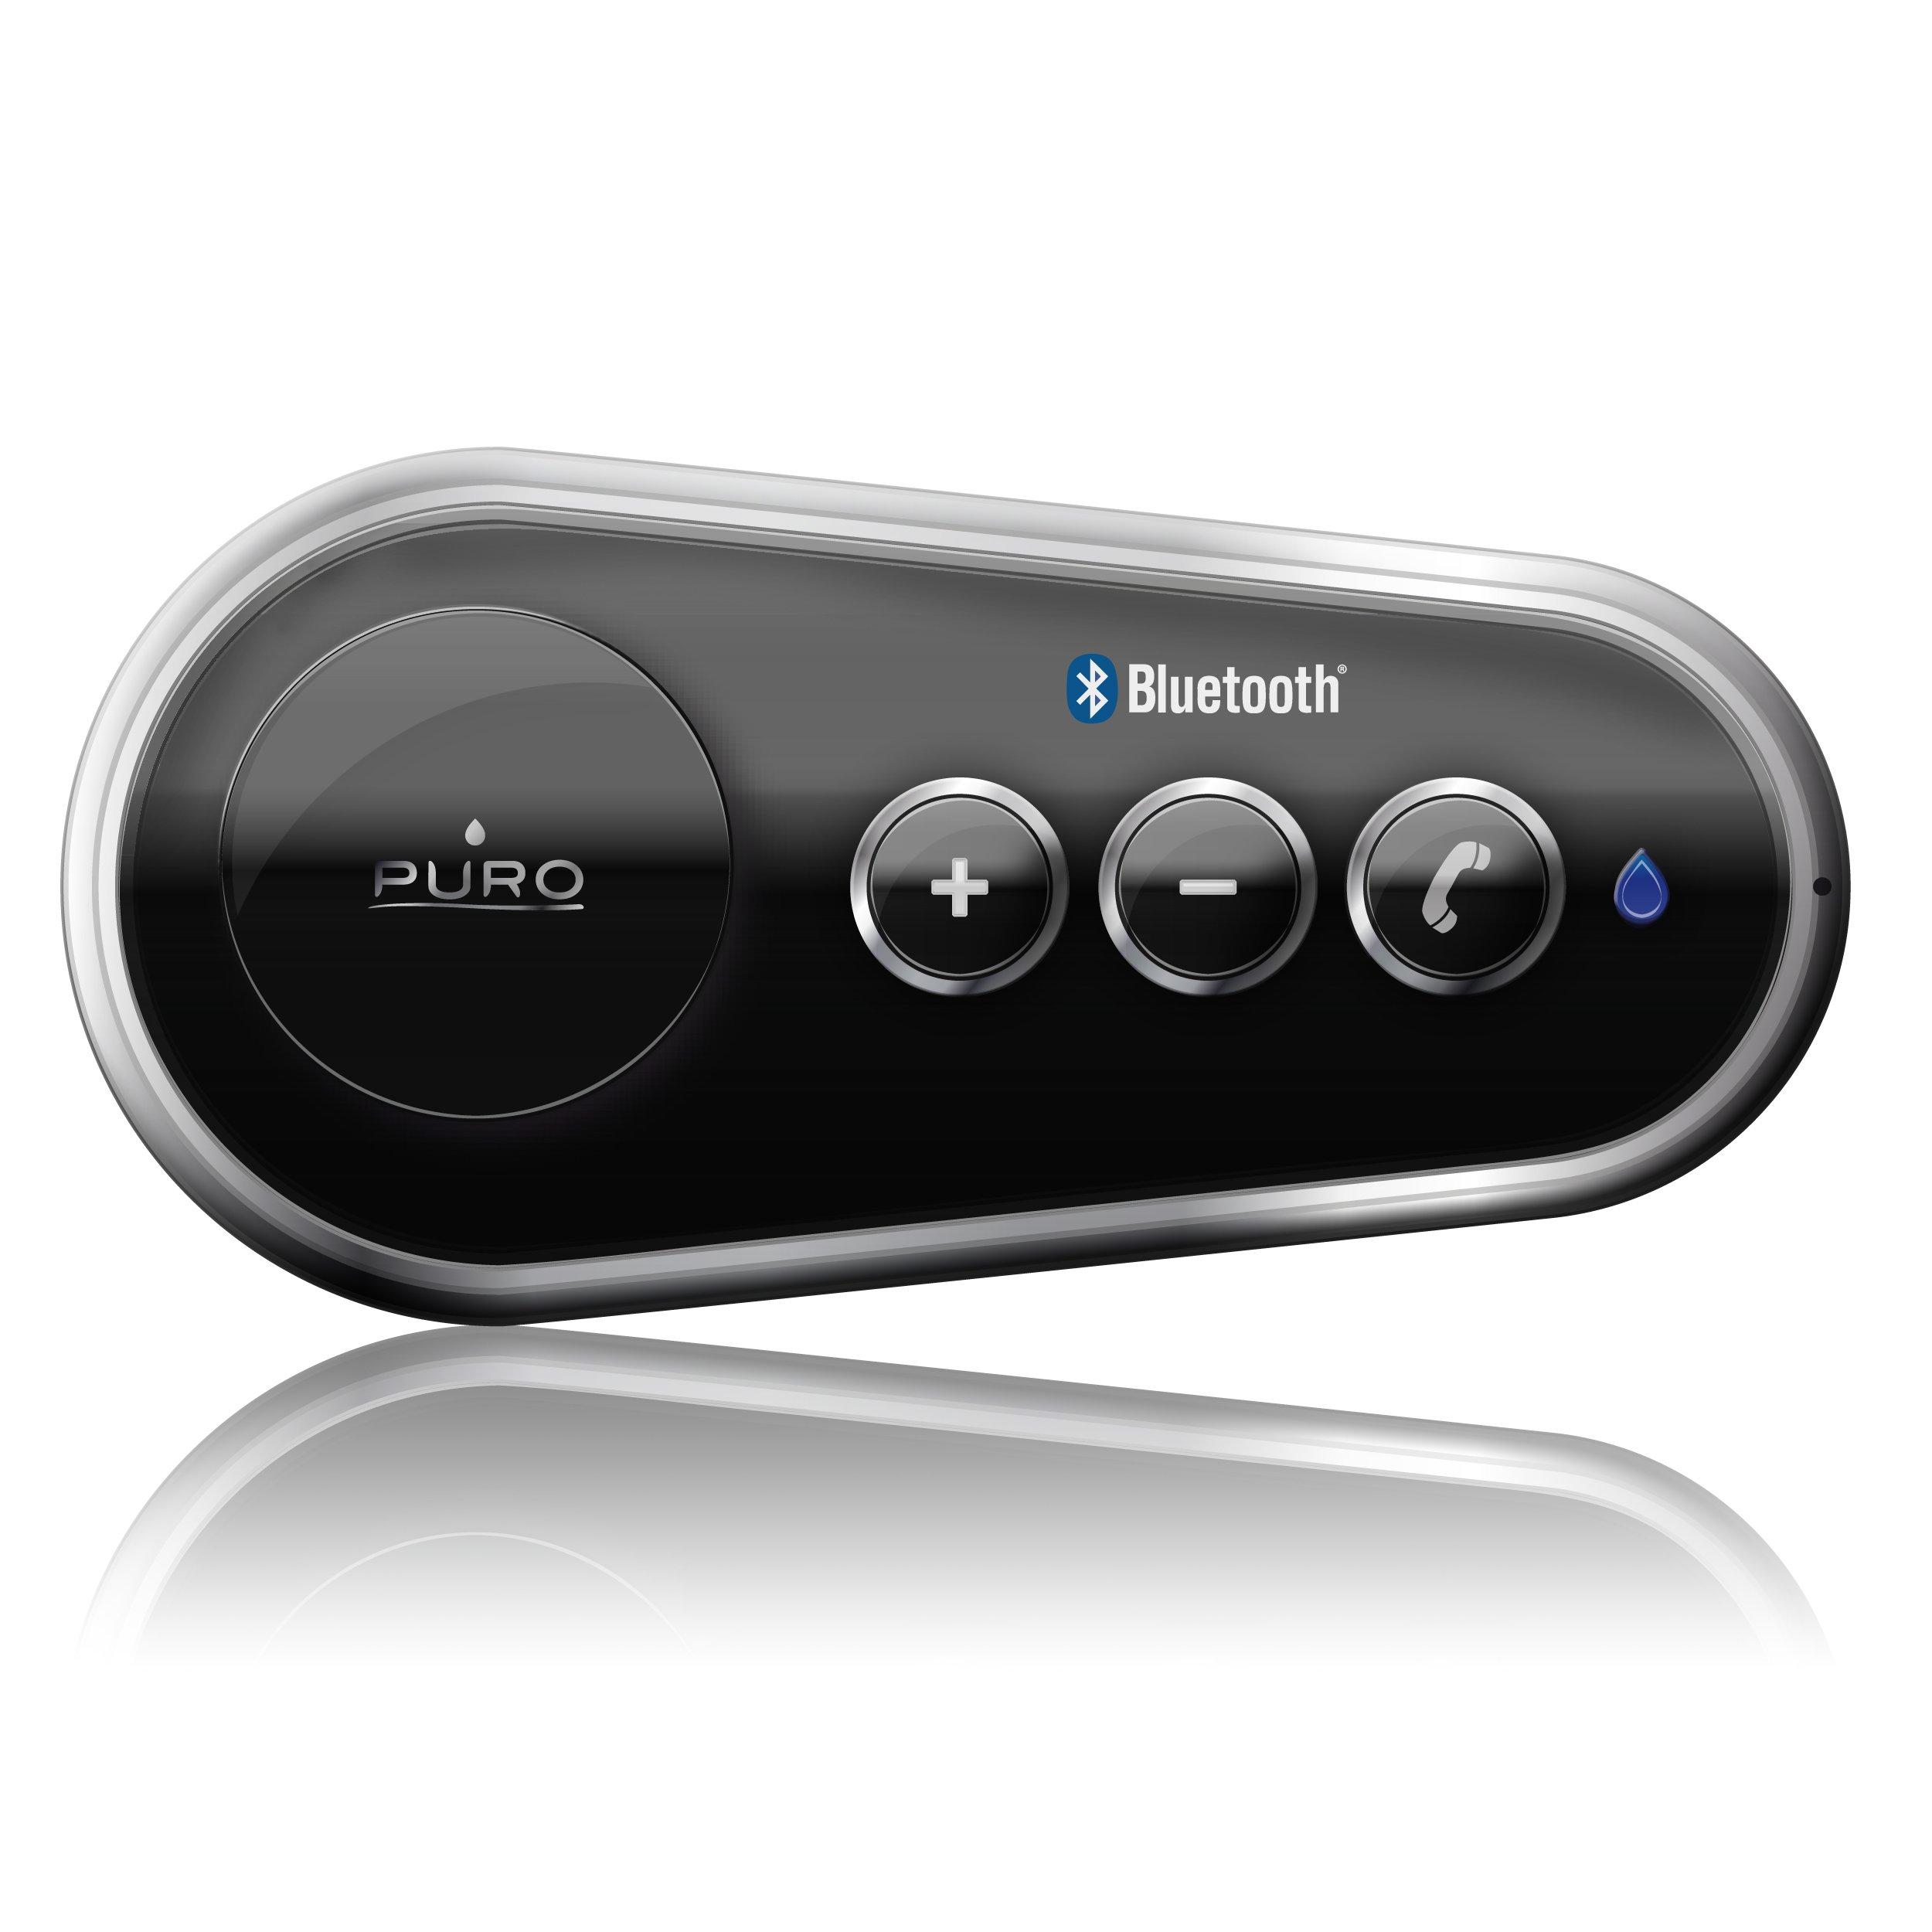 Vivavoce Bluetooth 3.0 Multipoint -0